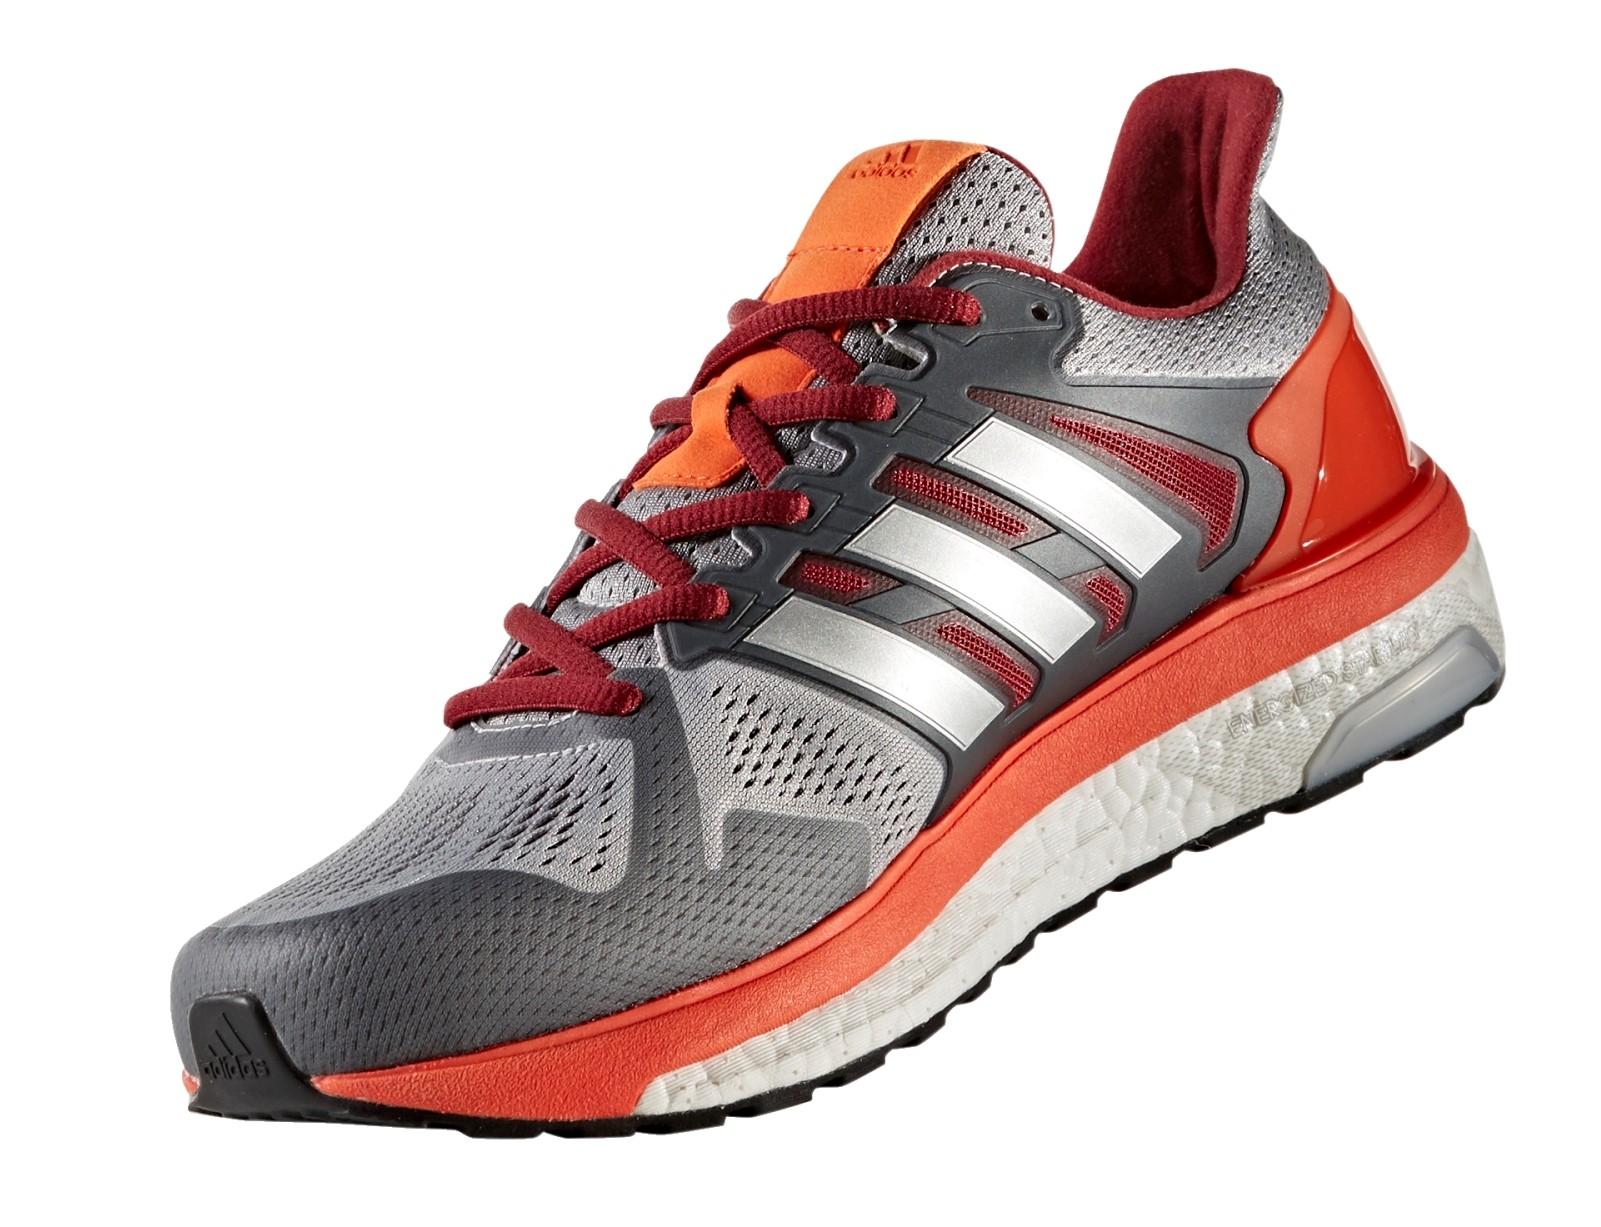 Pánské běžecké boty adidas SUPERNOVA ST šedé  4cc0074597